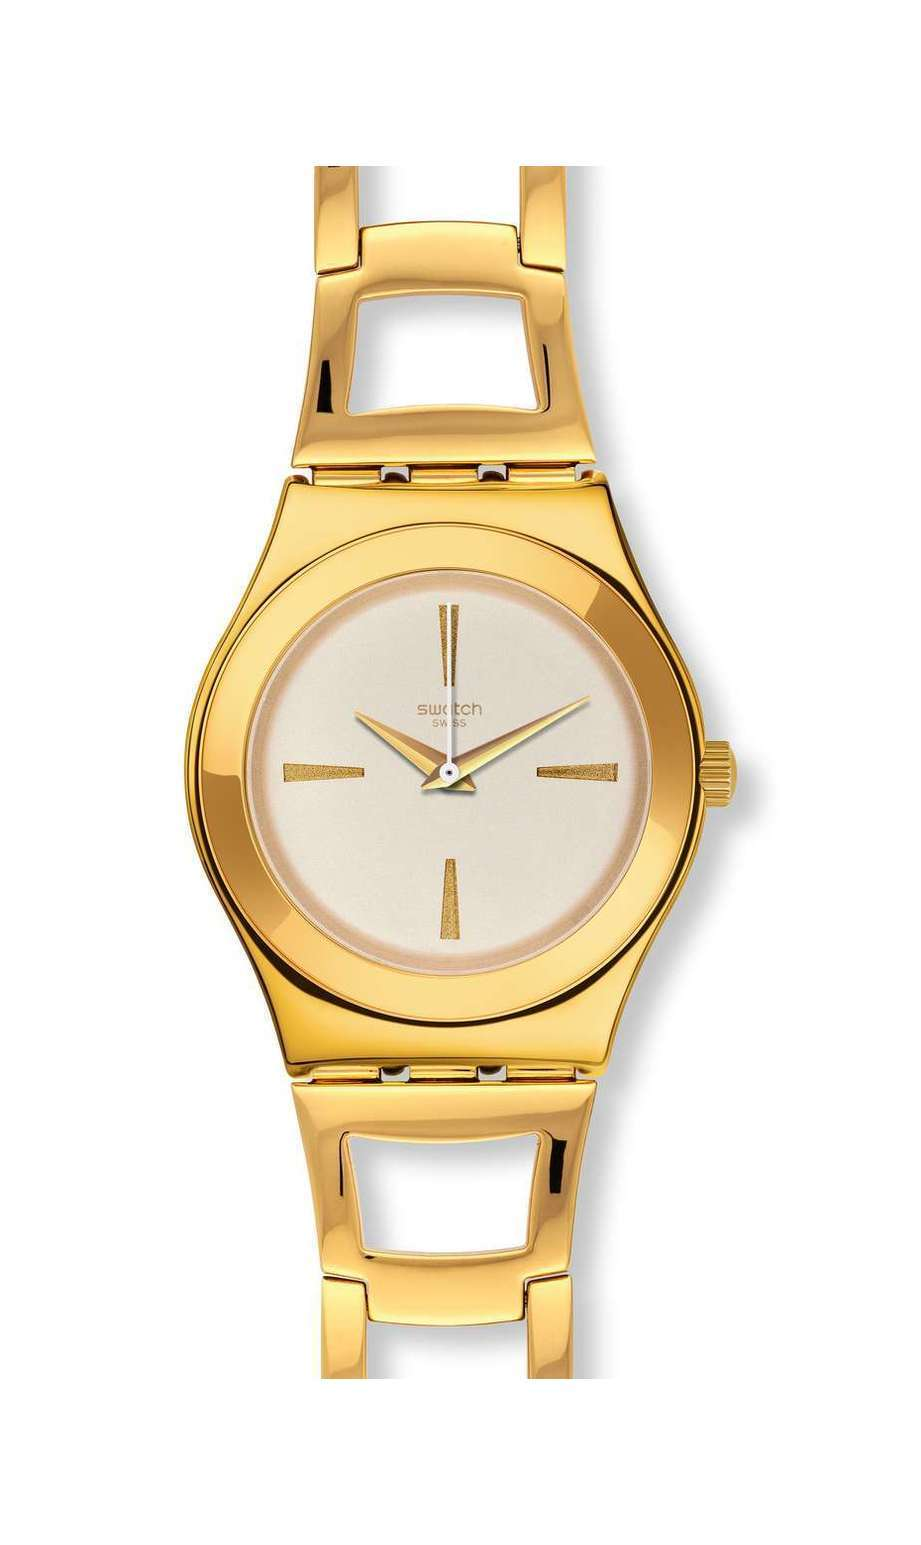 Swatch - GOLDENLI - 1